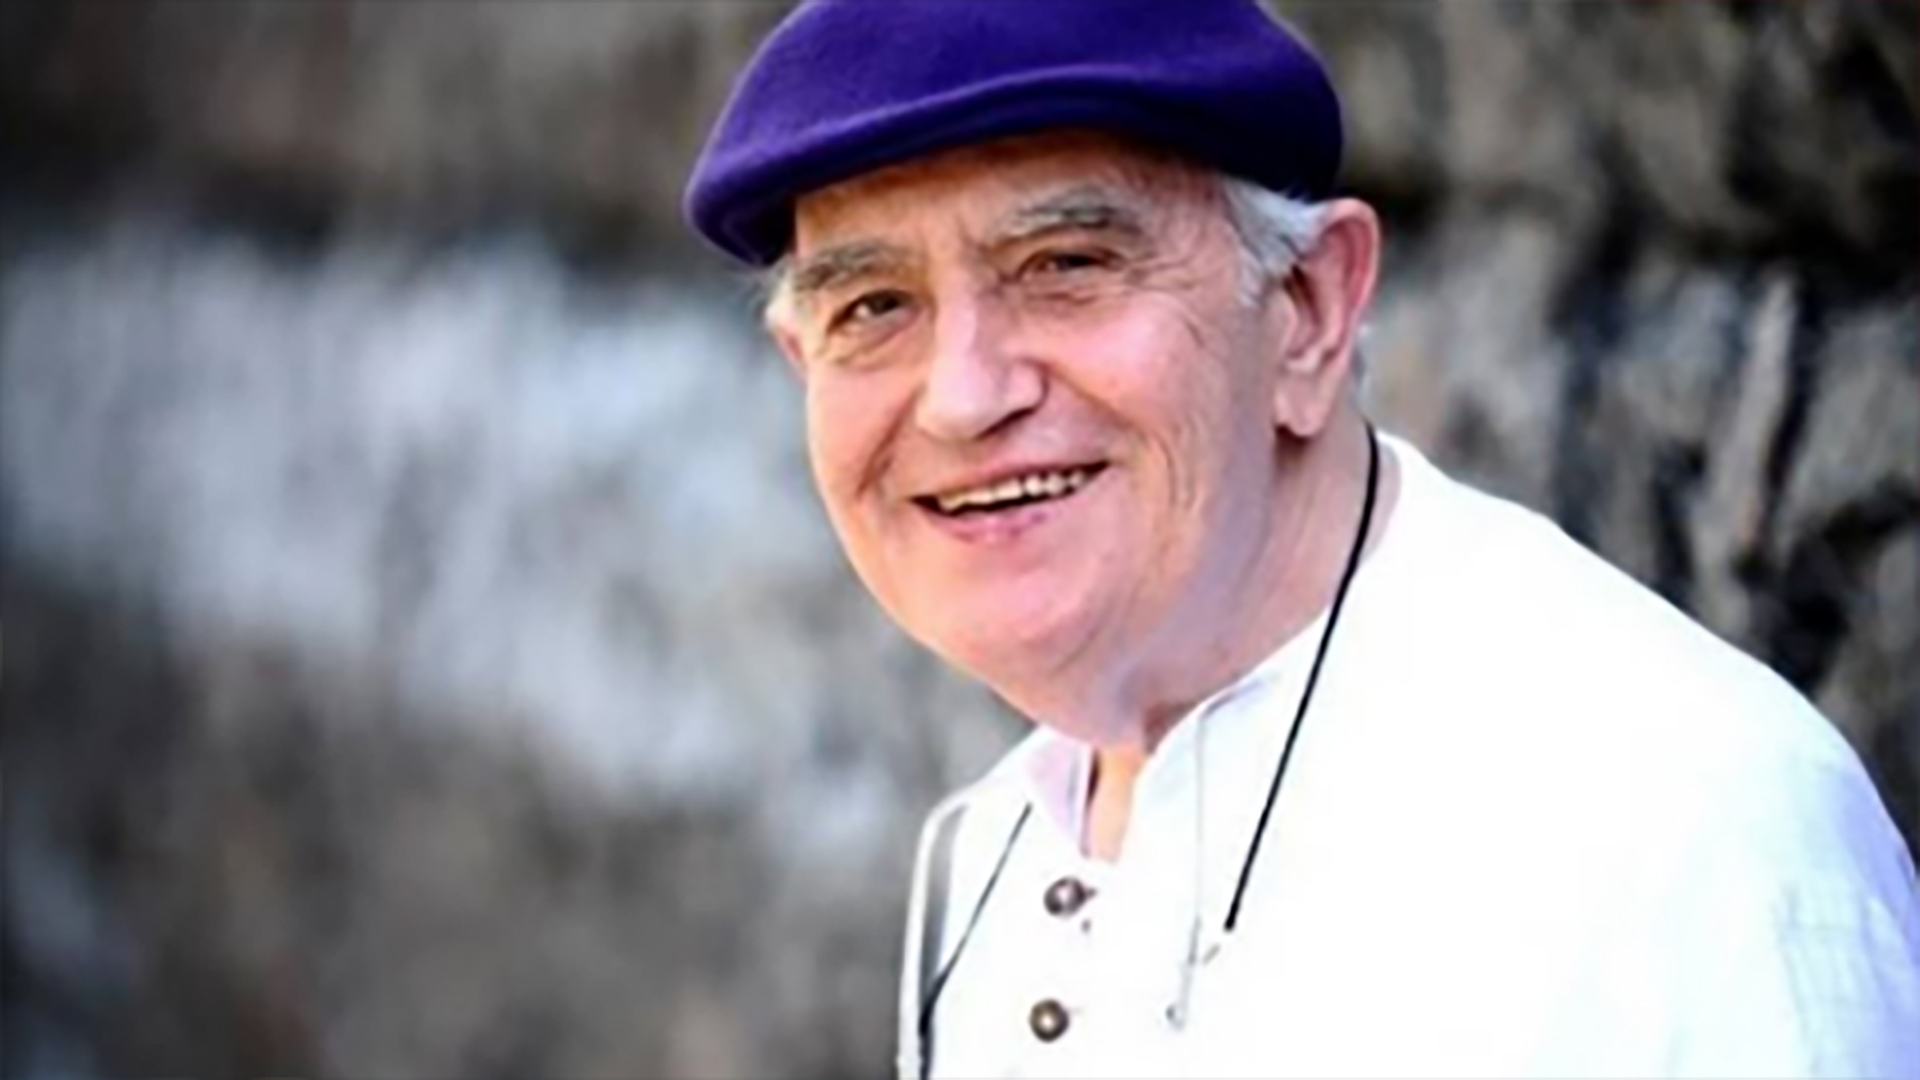 Hugo Padeletti